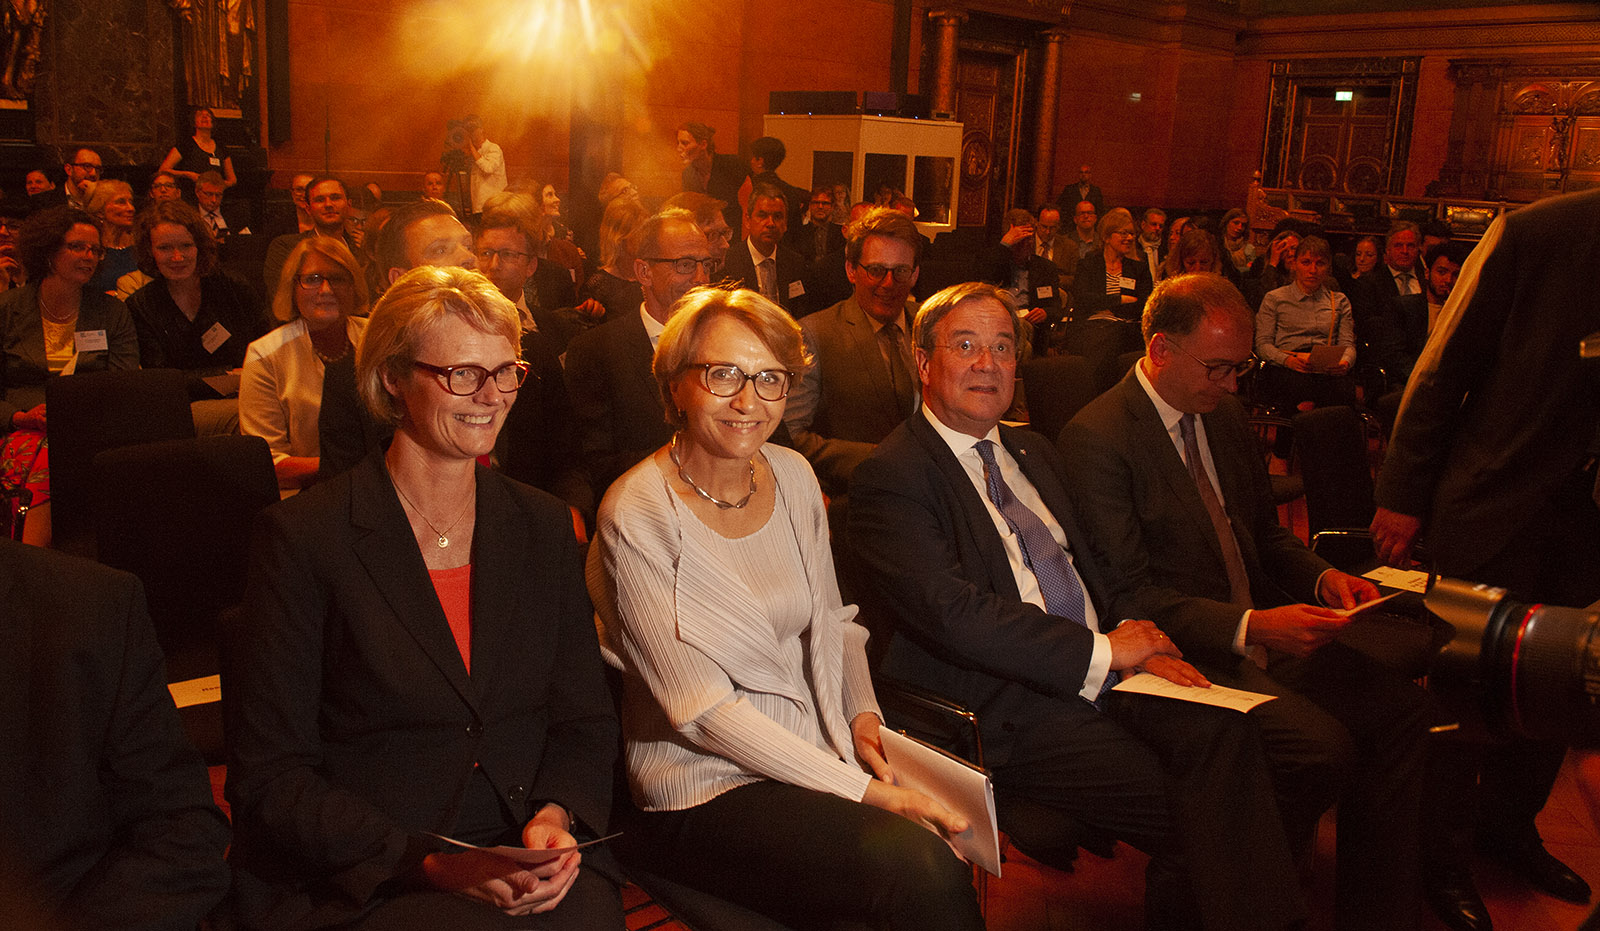 20 Jahre DFH (v.l.) Anja Karlicze, Anne-Marie Descôtes, Armin Laschet. Foto: Hilke Maunder